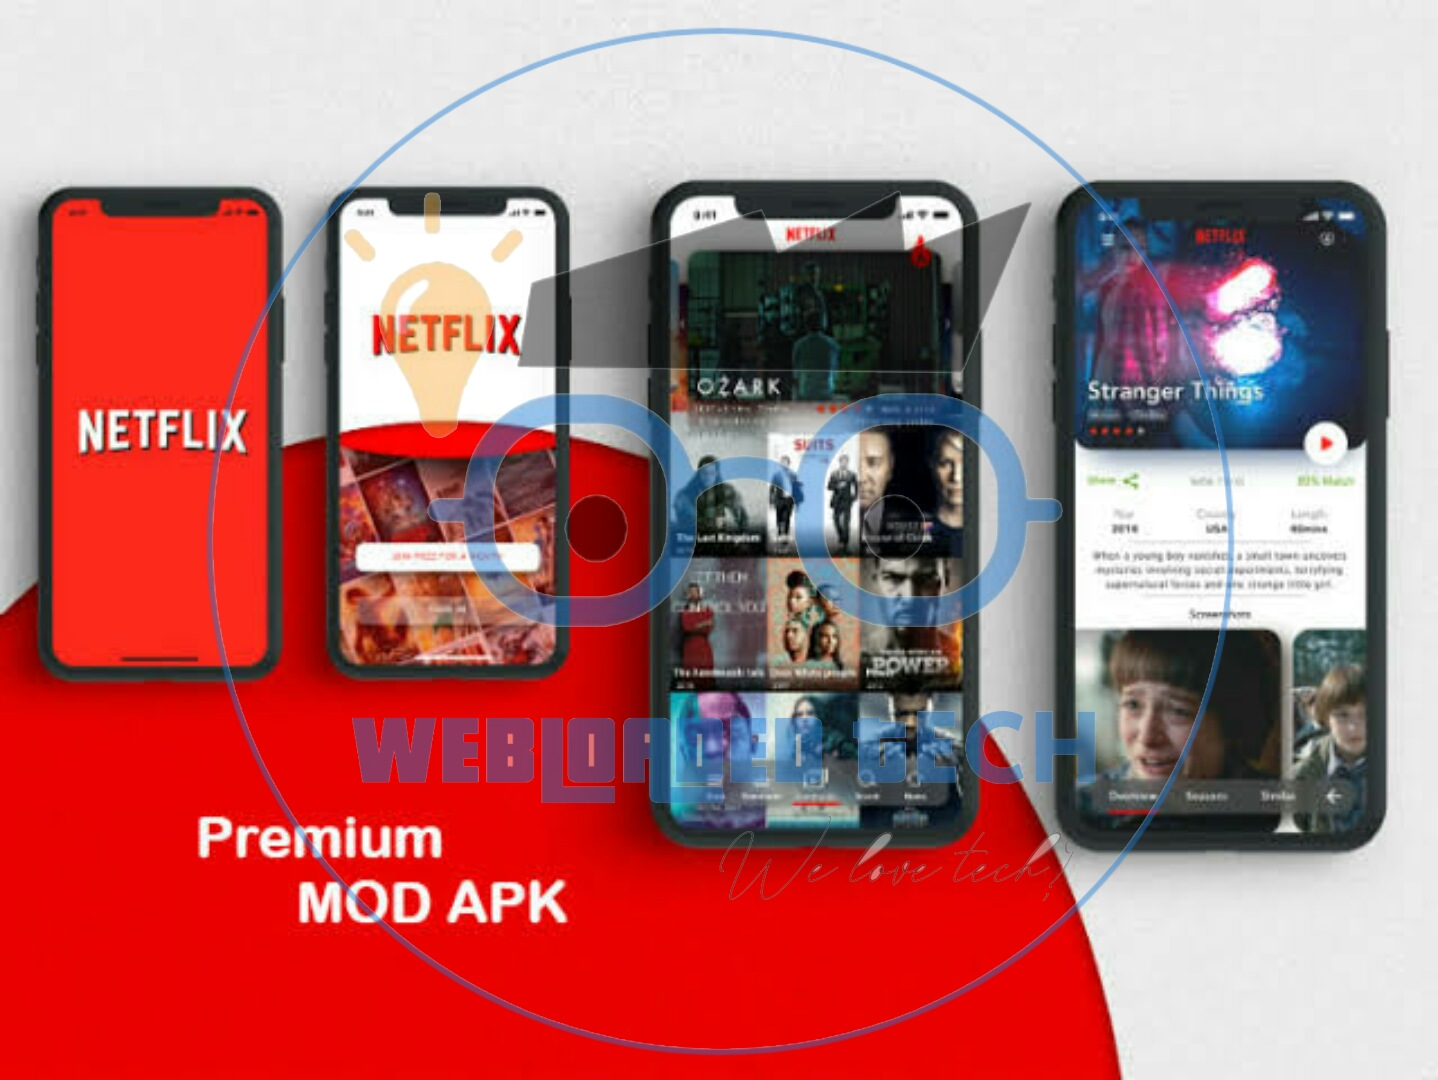 Netflix Mod Apk Latest Version, Netflix Mod APK for Android – Premium Unlocked, 4K, No ads